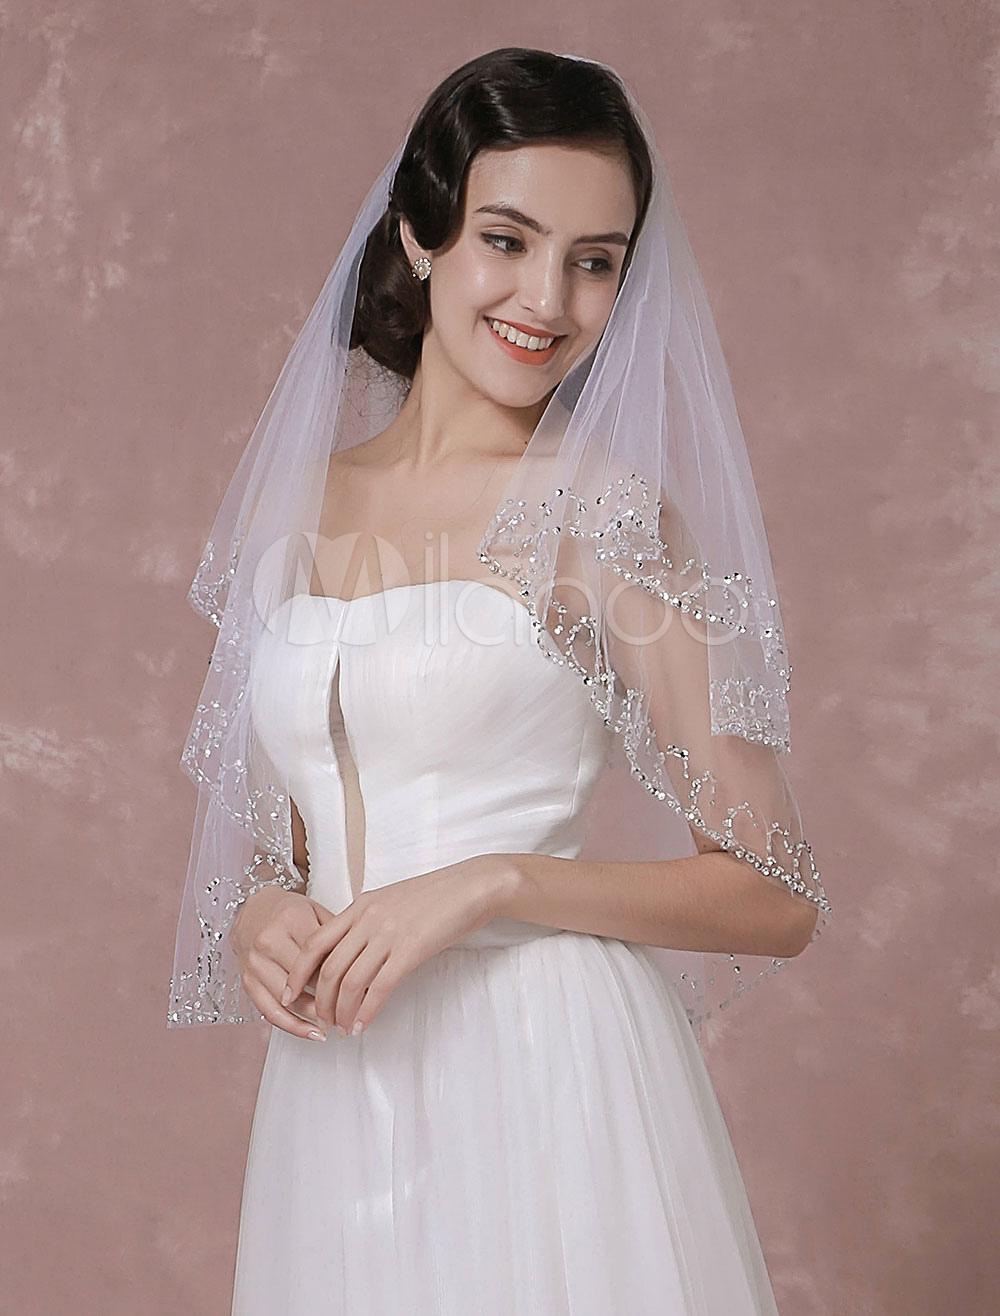 Tulle Wedding Veil Sequins 2-Tier Bridal Veil With Handmade Beaded Edge